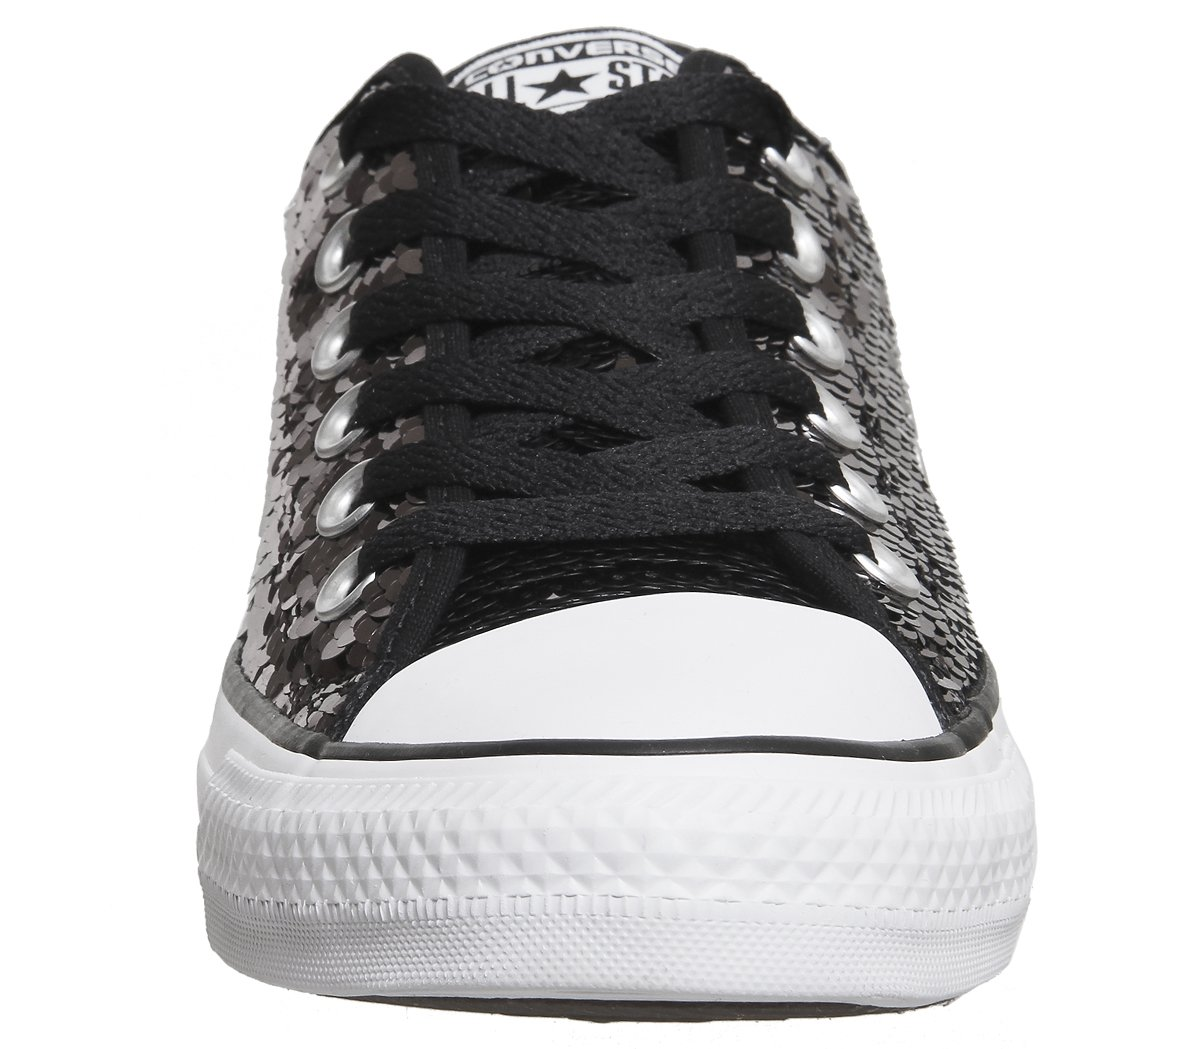 Converse Chuck Taylor Sequin Women's Sneakers B06XJCDR59 9 B US|Gunmetal/White/Black